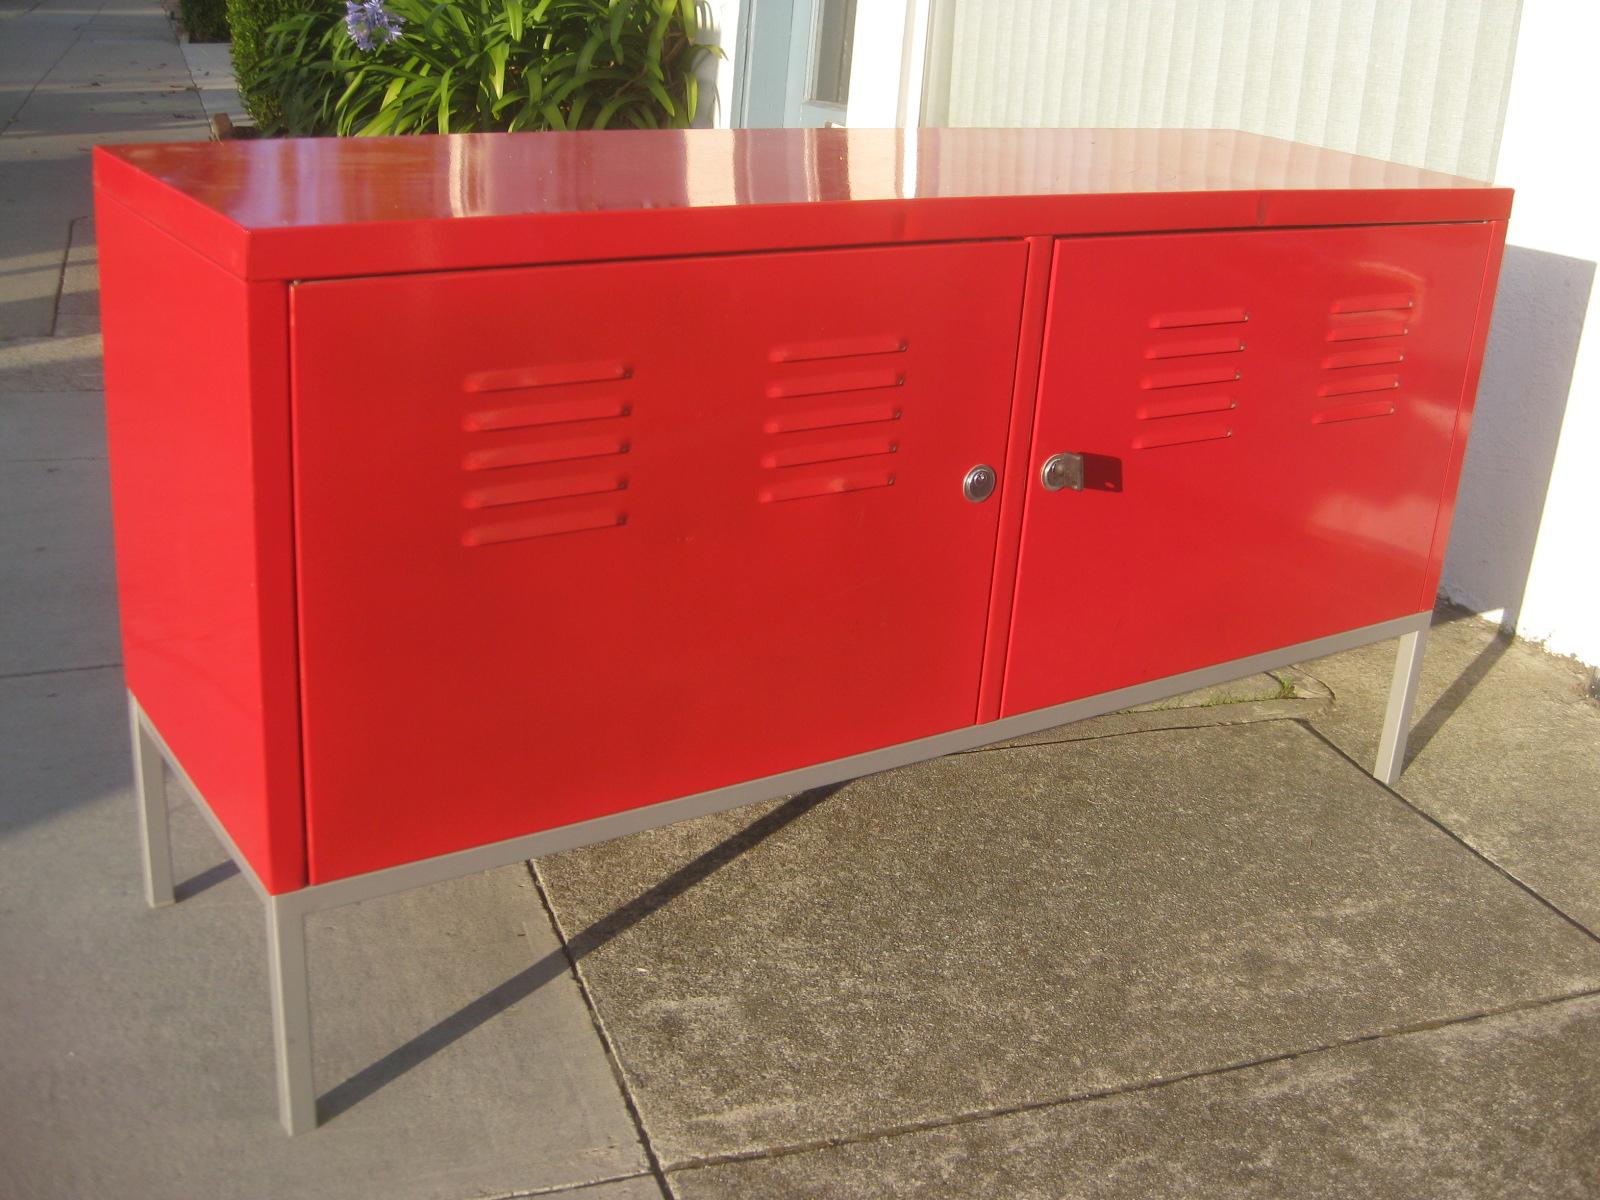 Uhuru furniture collectibles sold rocket red lockers - Mueble rojo ikea ...